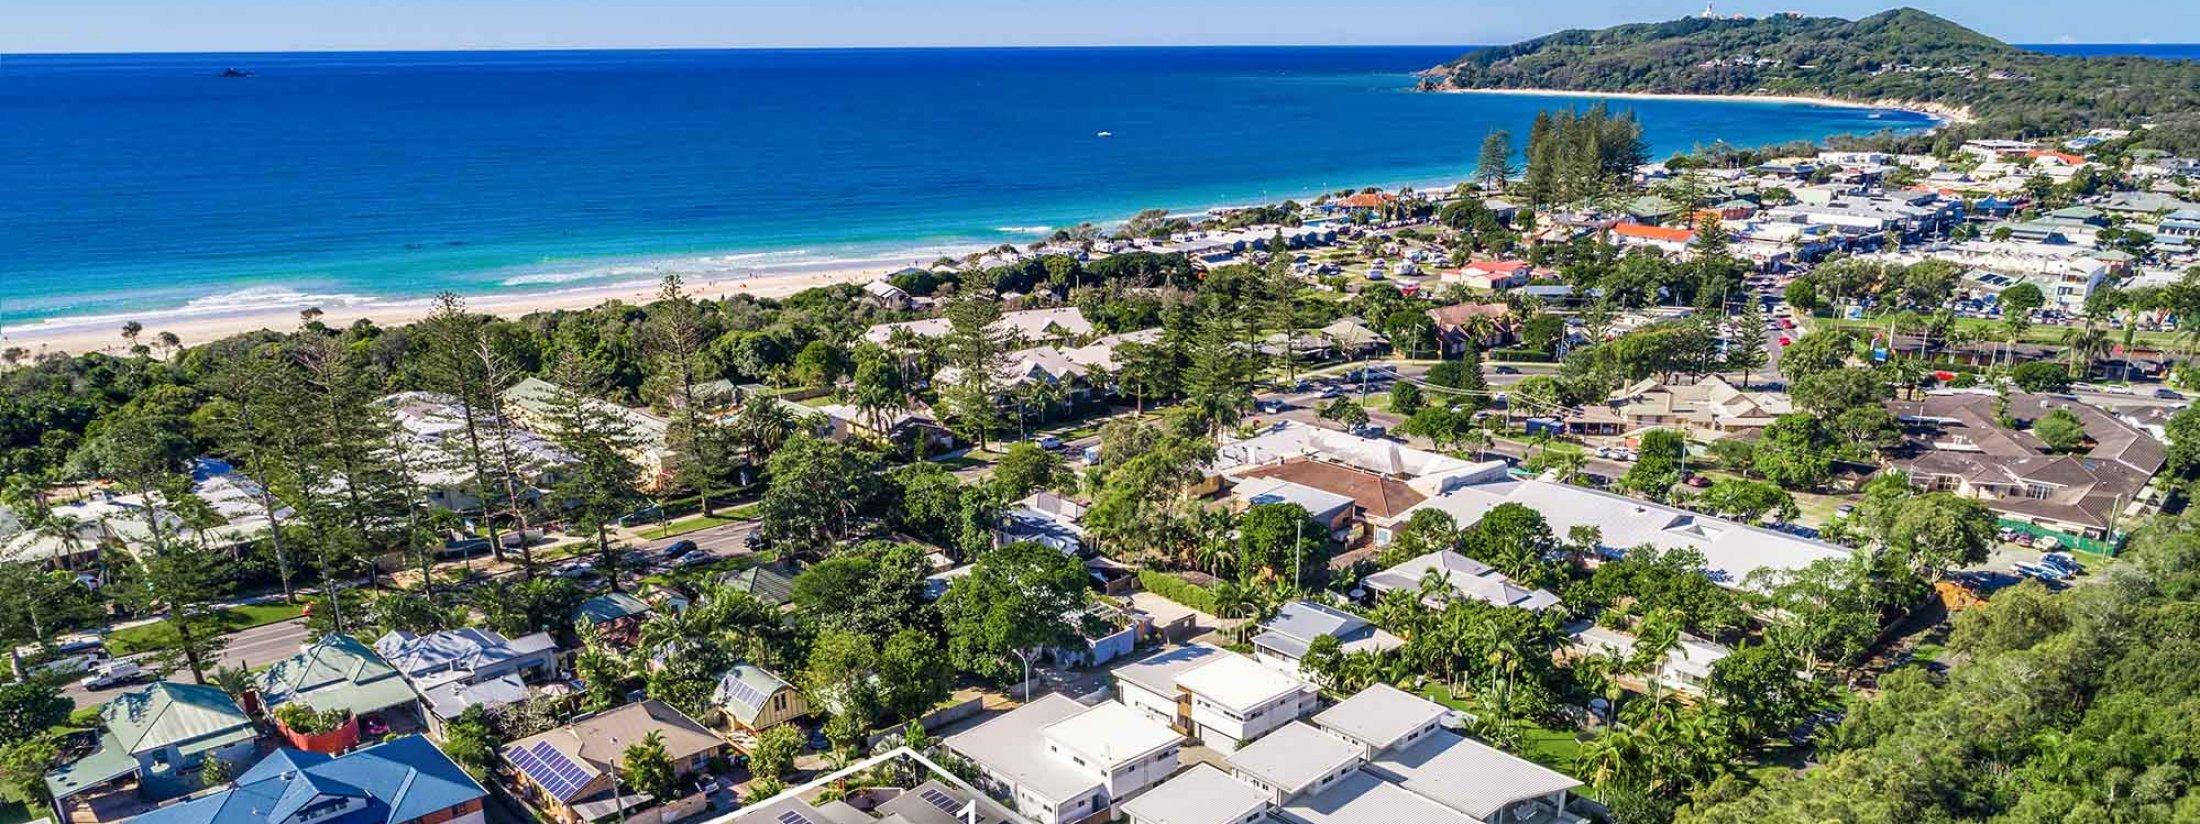 Clique 3 - Byron Bay - Aerial Towards Cape Byron Outline